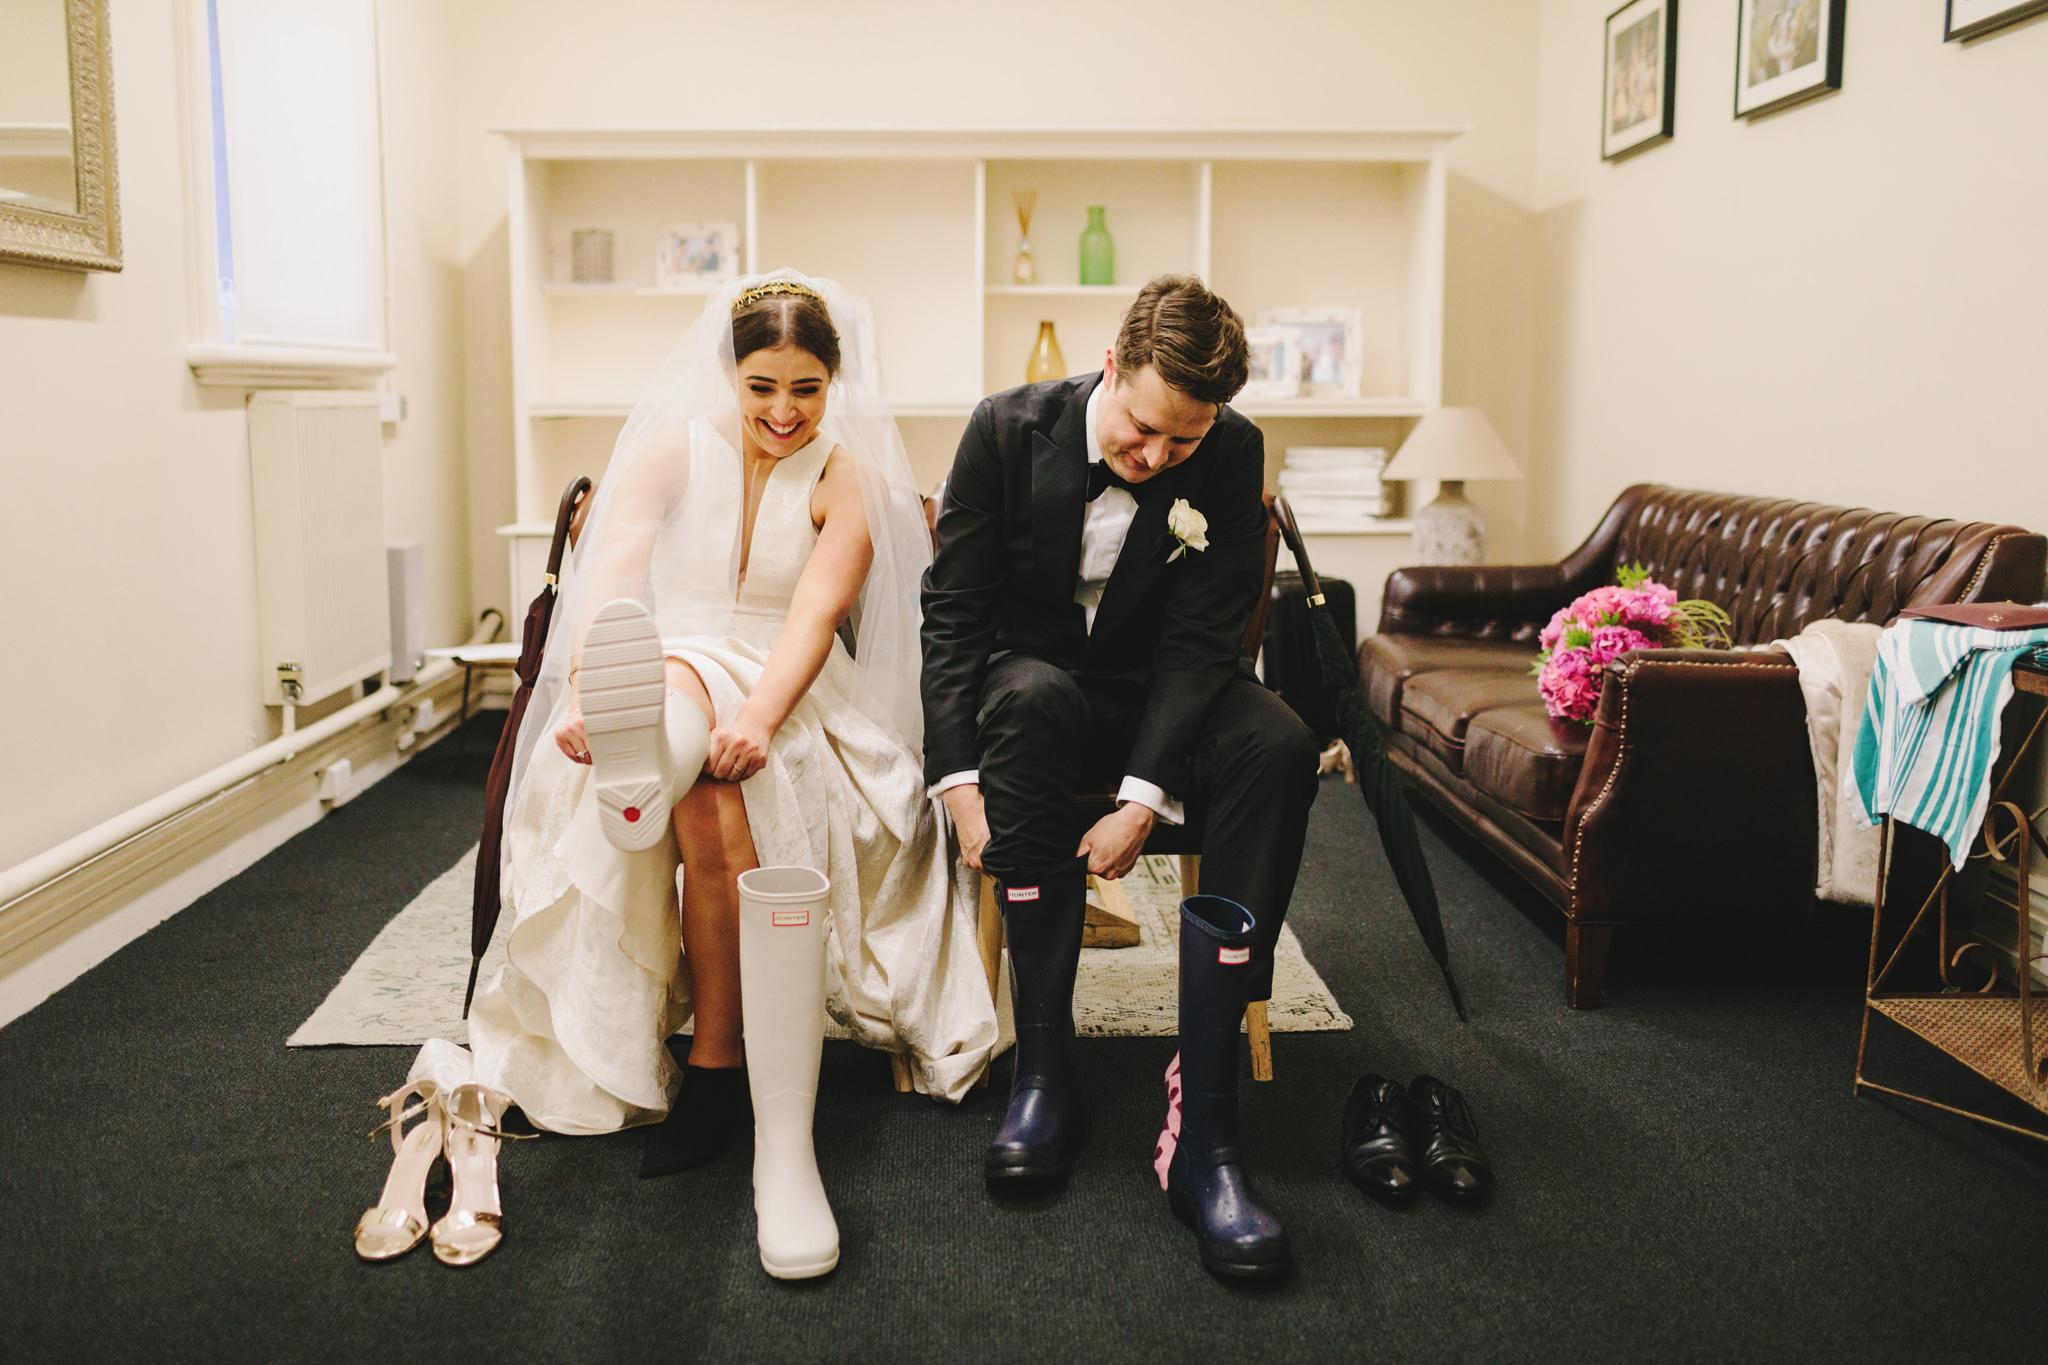 Abbotsford_Convent_Wedding_Peter_Anna088.JPG